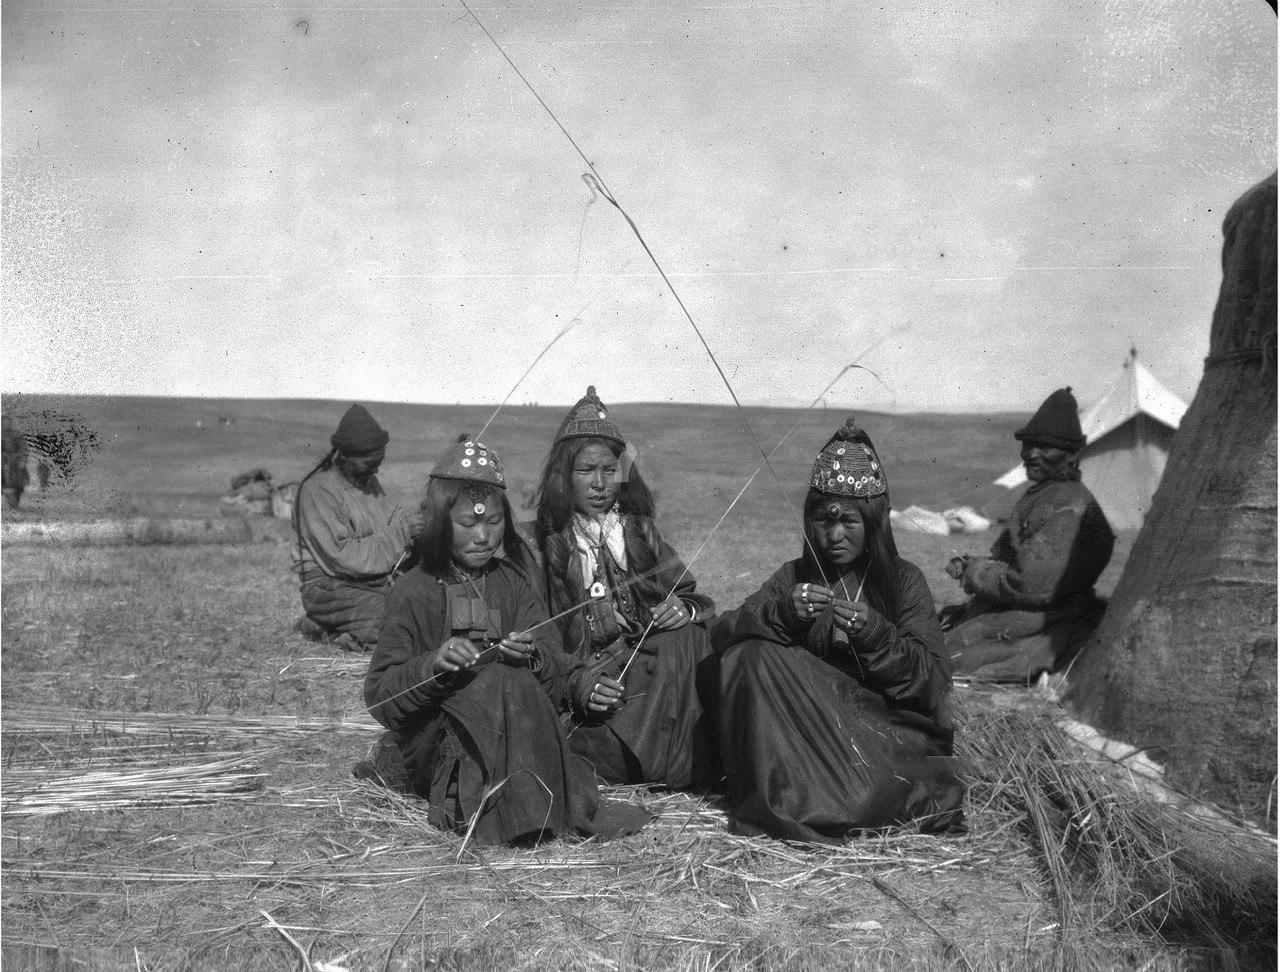 Семья богатого калмыка Насамбатина за работой возле юрты